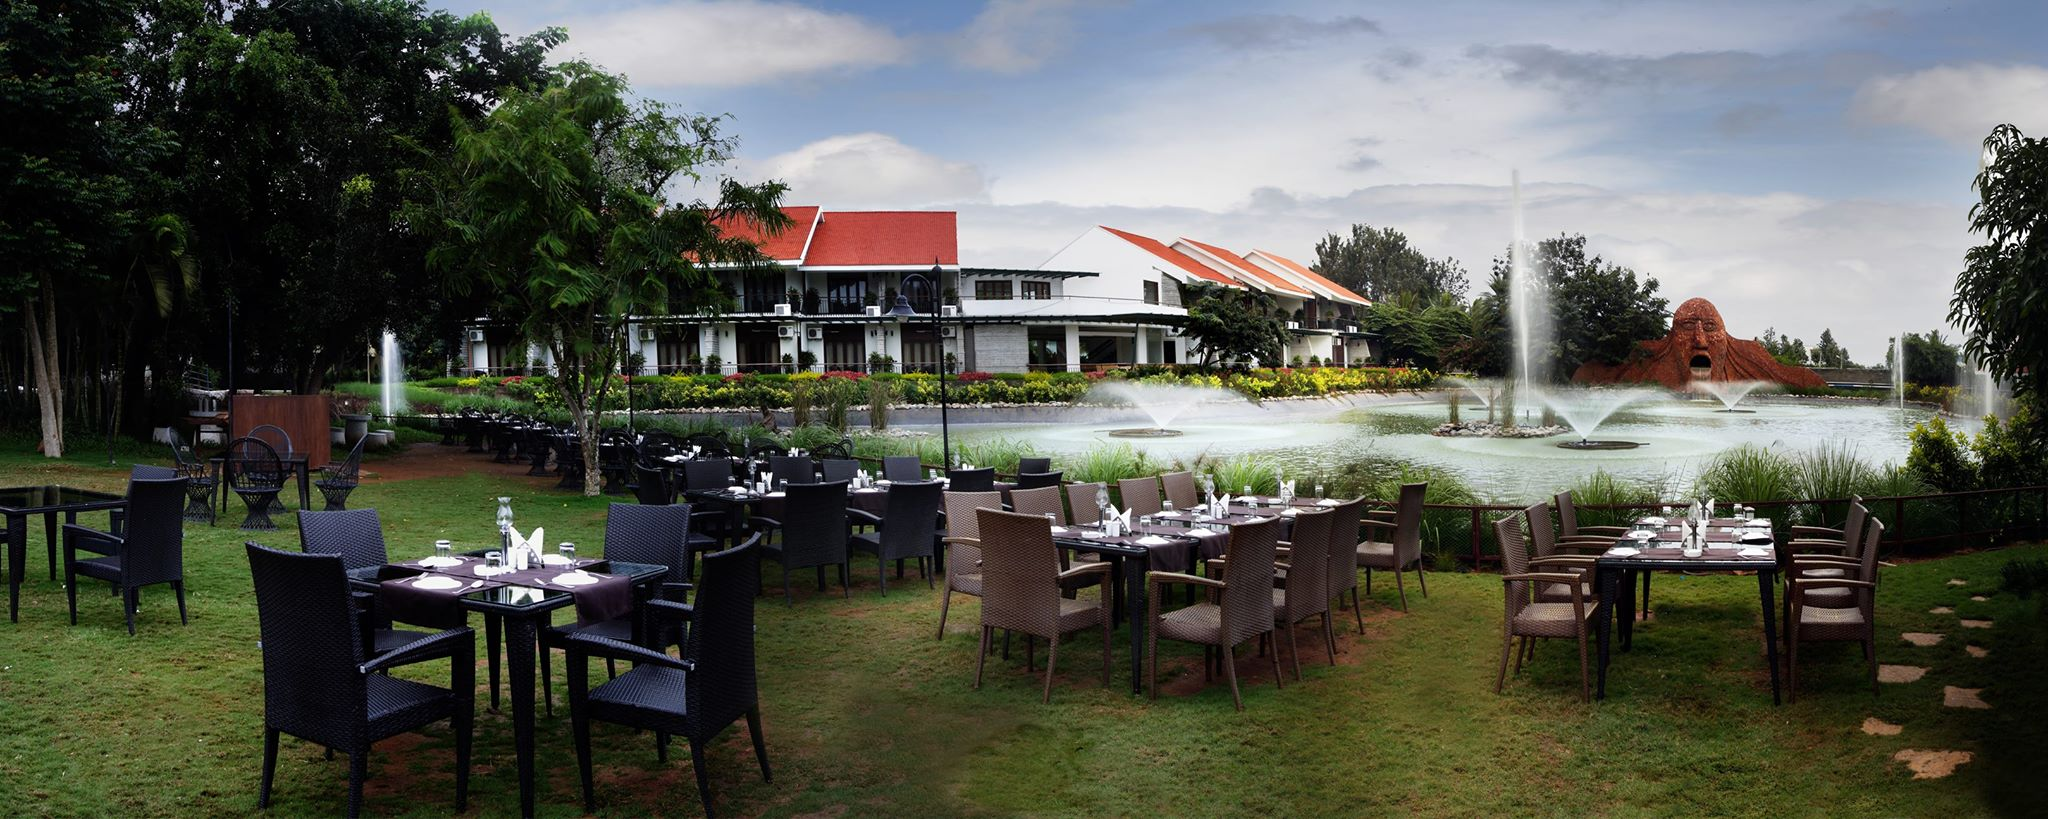 silent-shores-ayurveda-resort-and-spa-mysore-karnataka-11